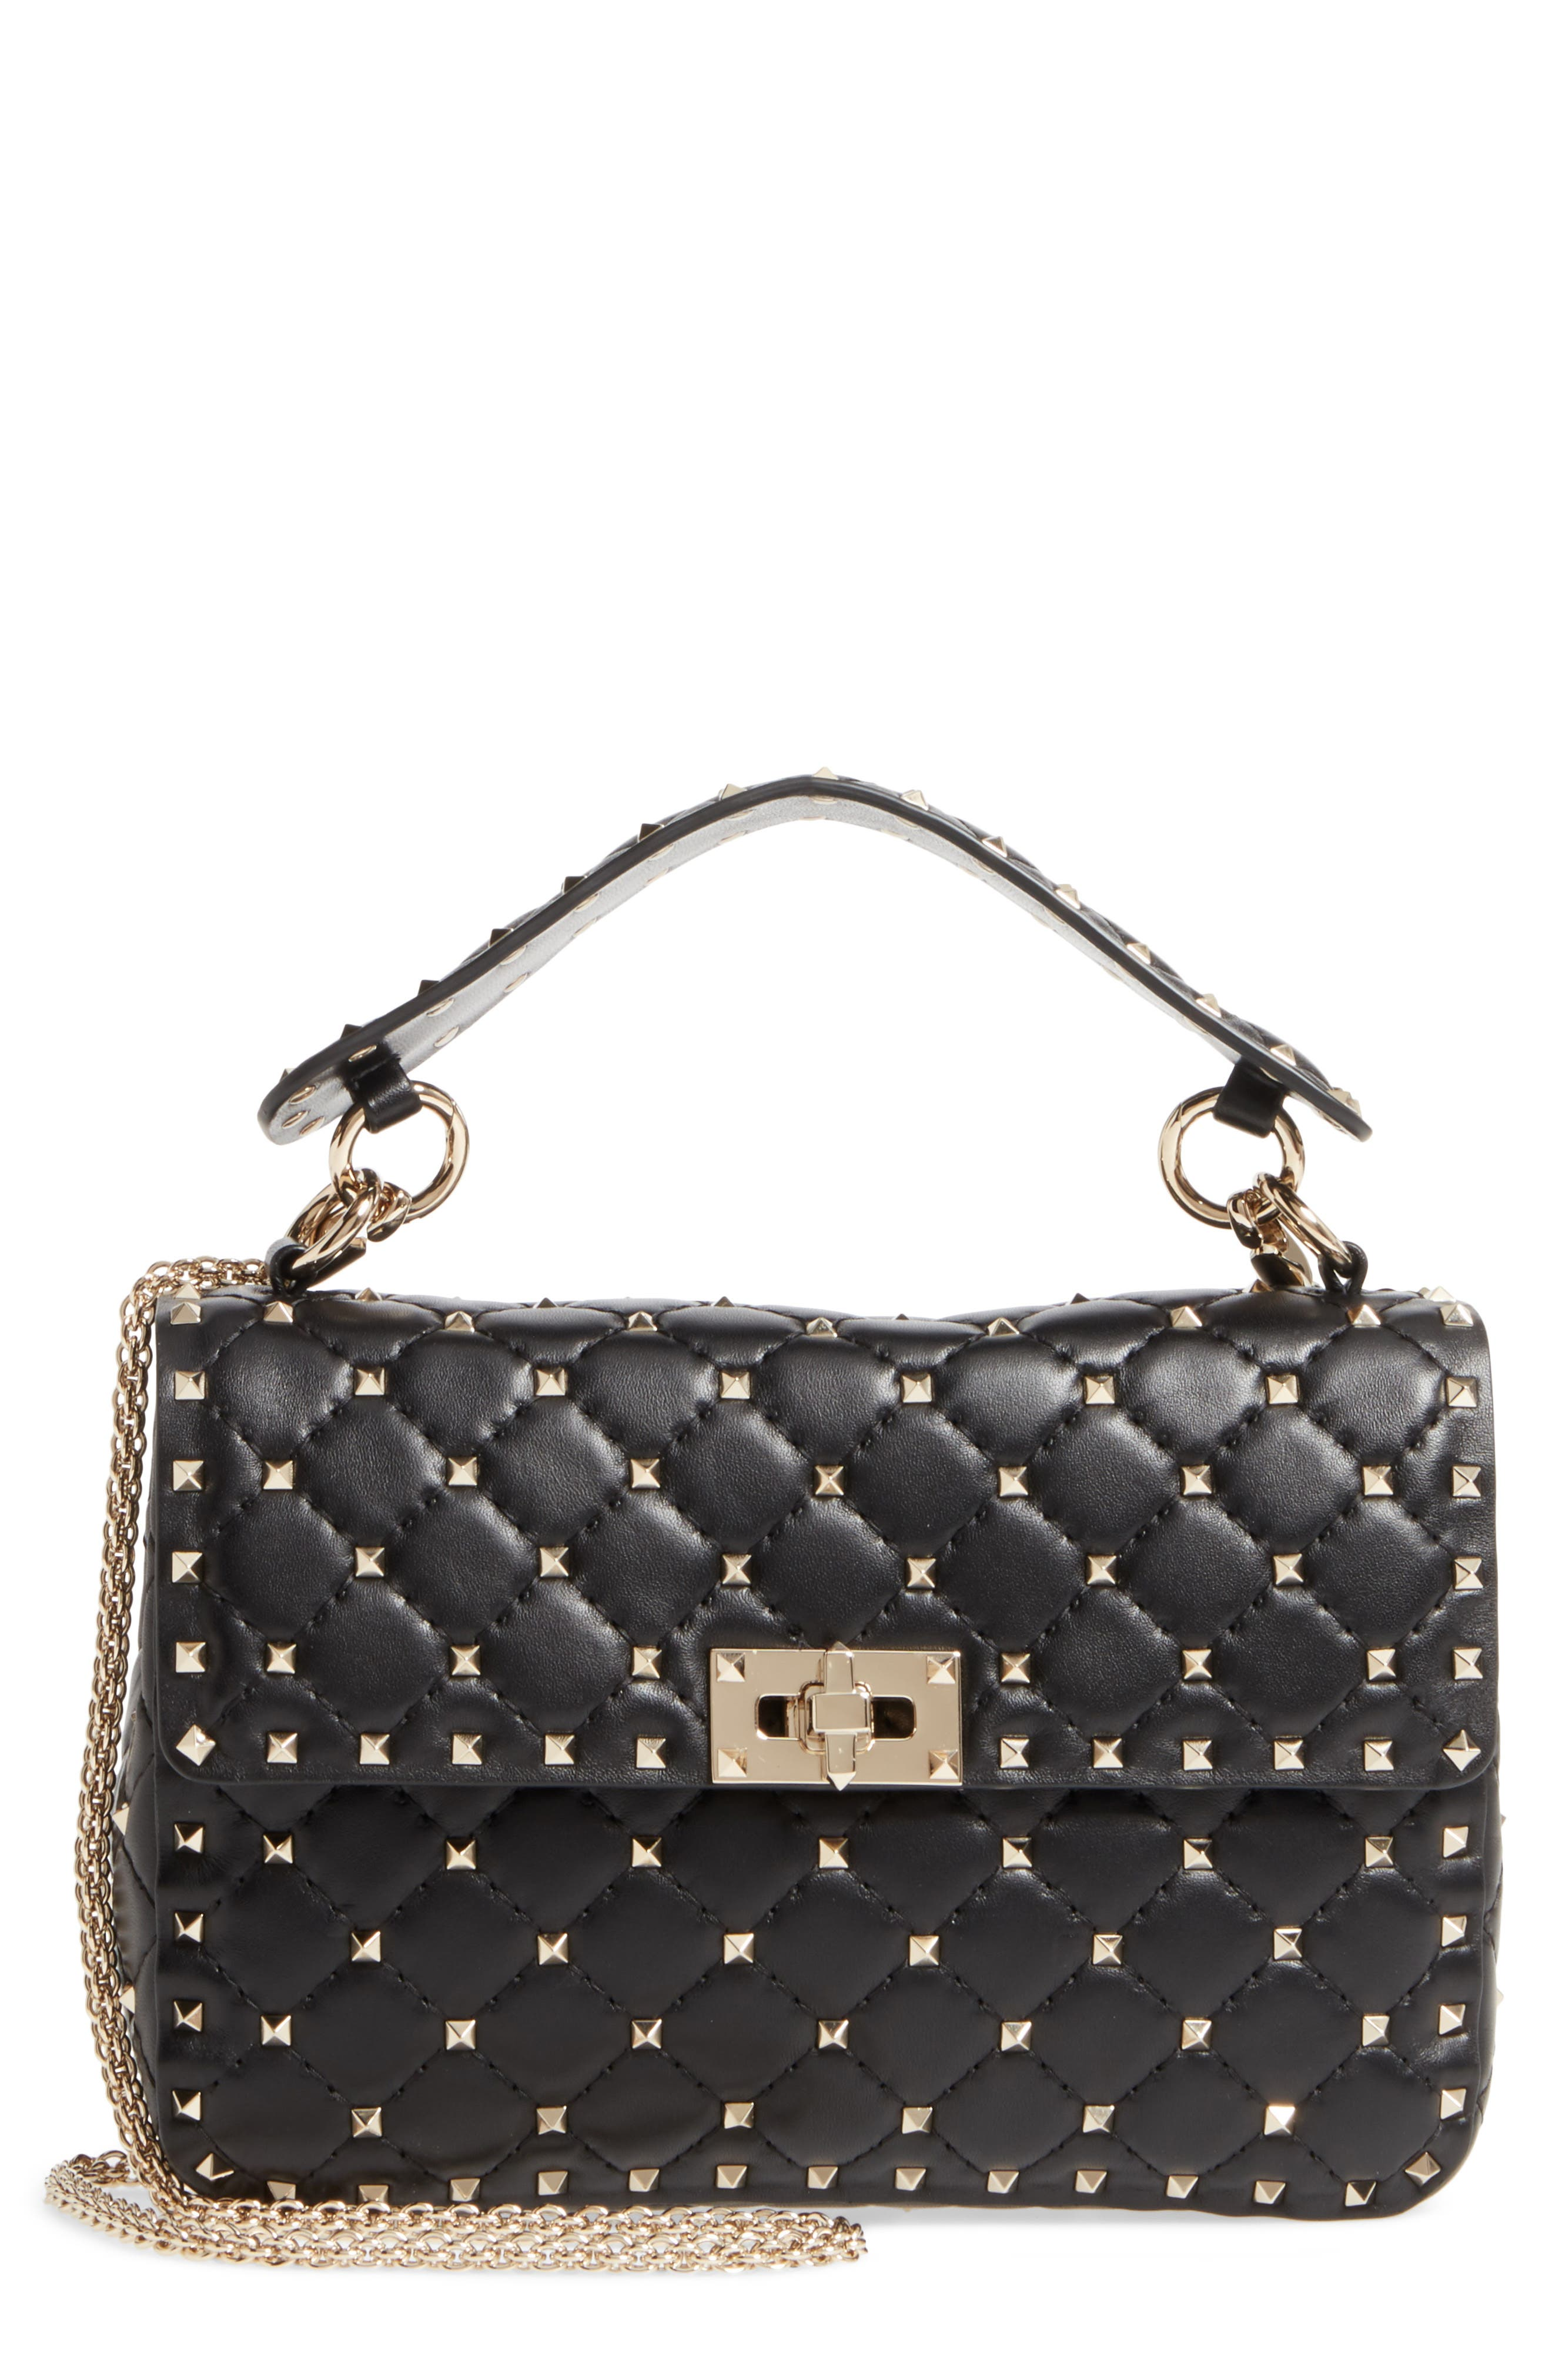 Medium Rockstud Matelassé Quilted Leather Shoulder Bag,                             Main thumbnail 1, color,                             BLACK